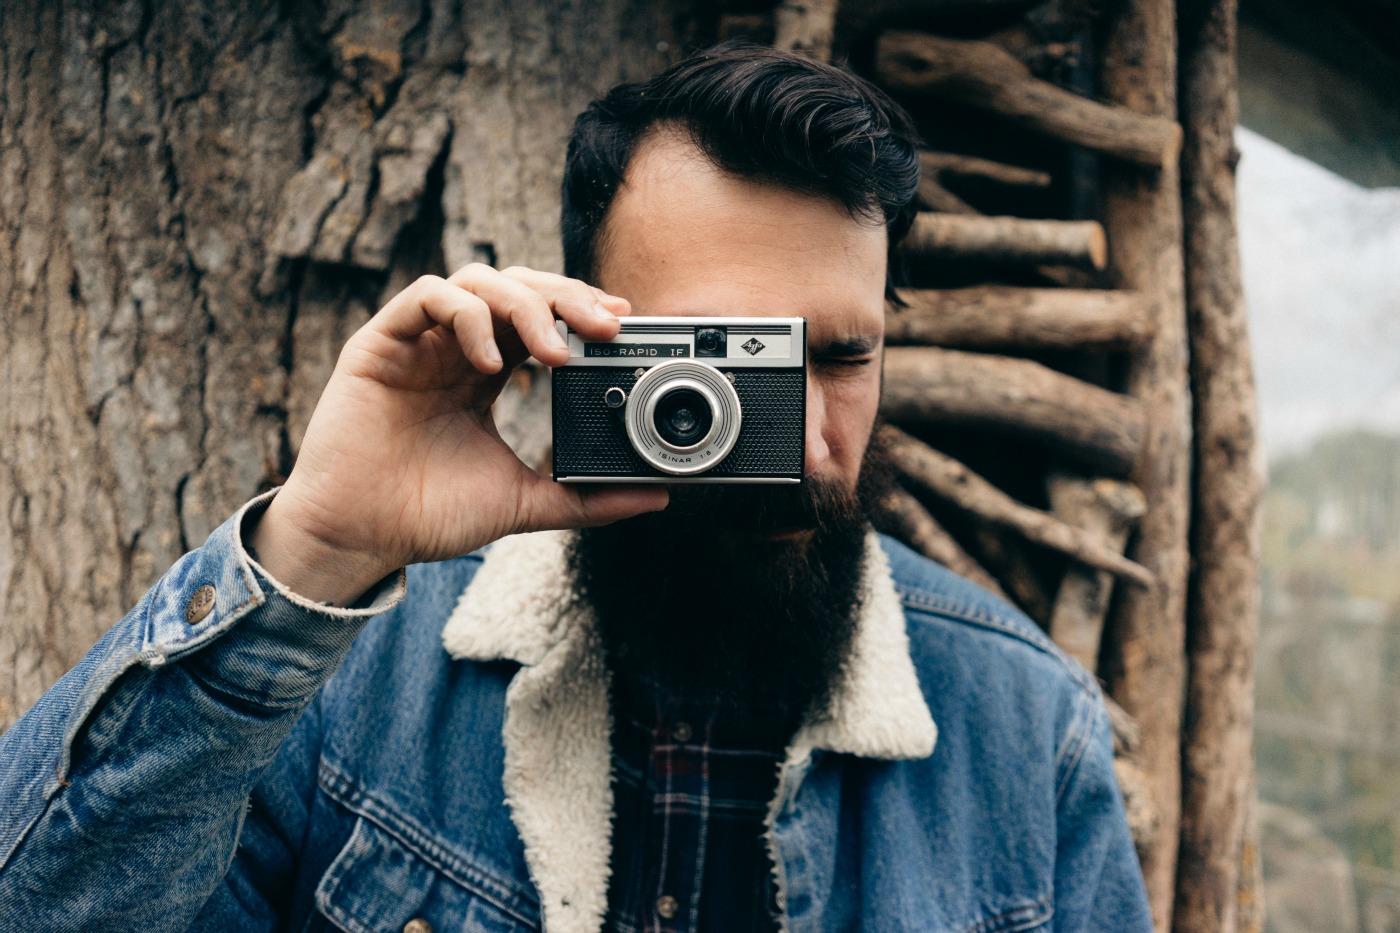 cultural-creative-hipster-camera-millenial